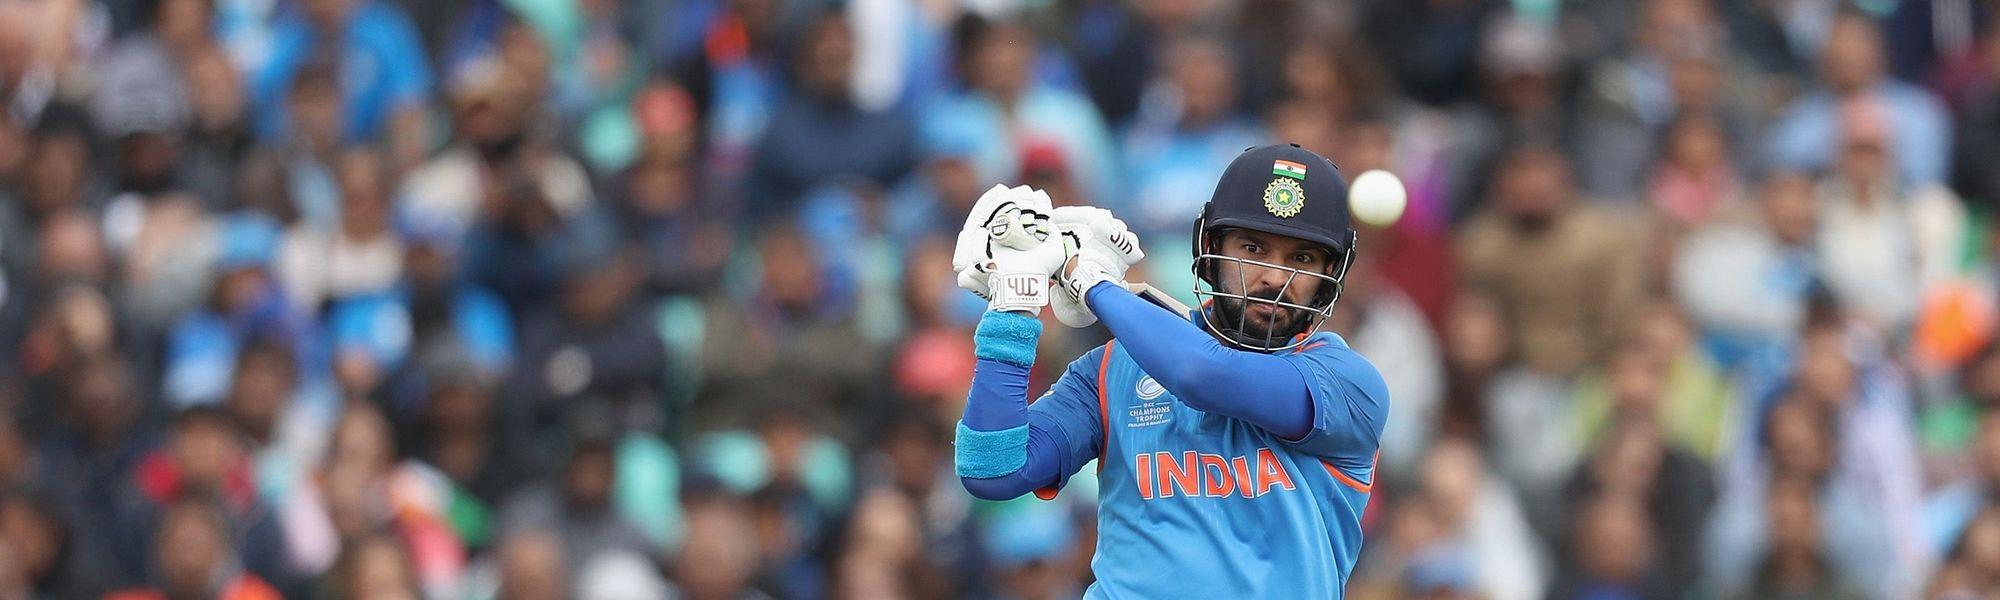 Yuvraj Singh has announced his retirement from all international cricket